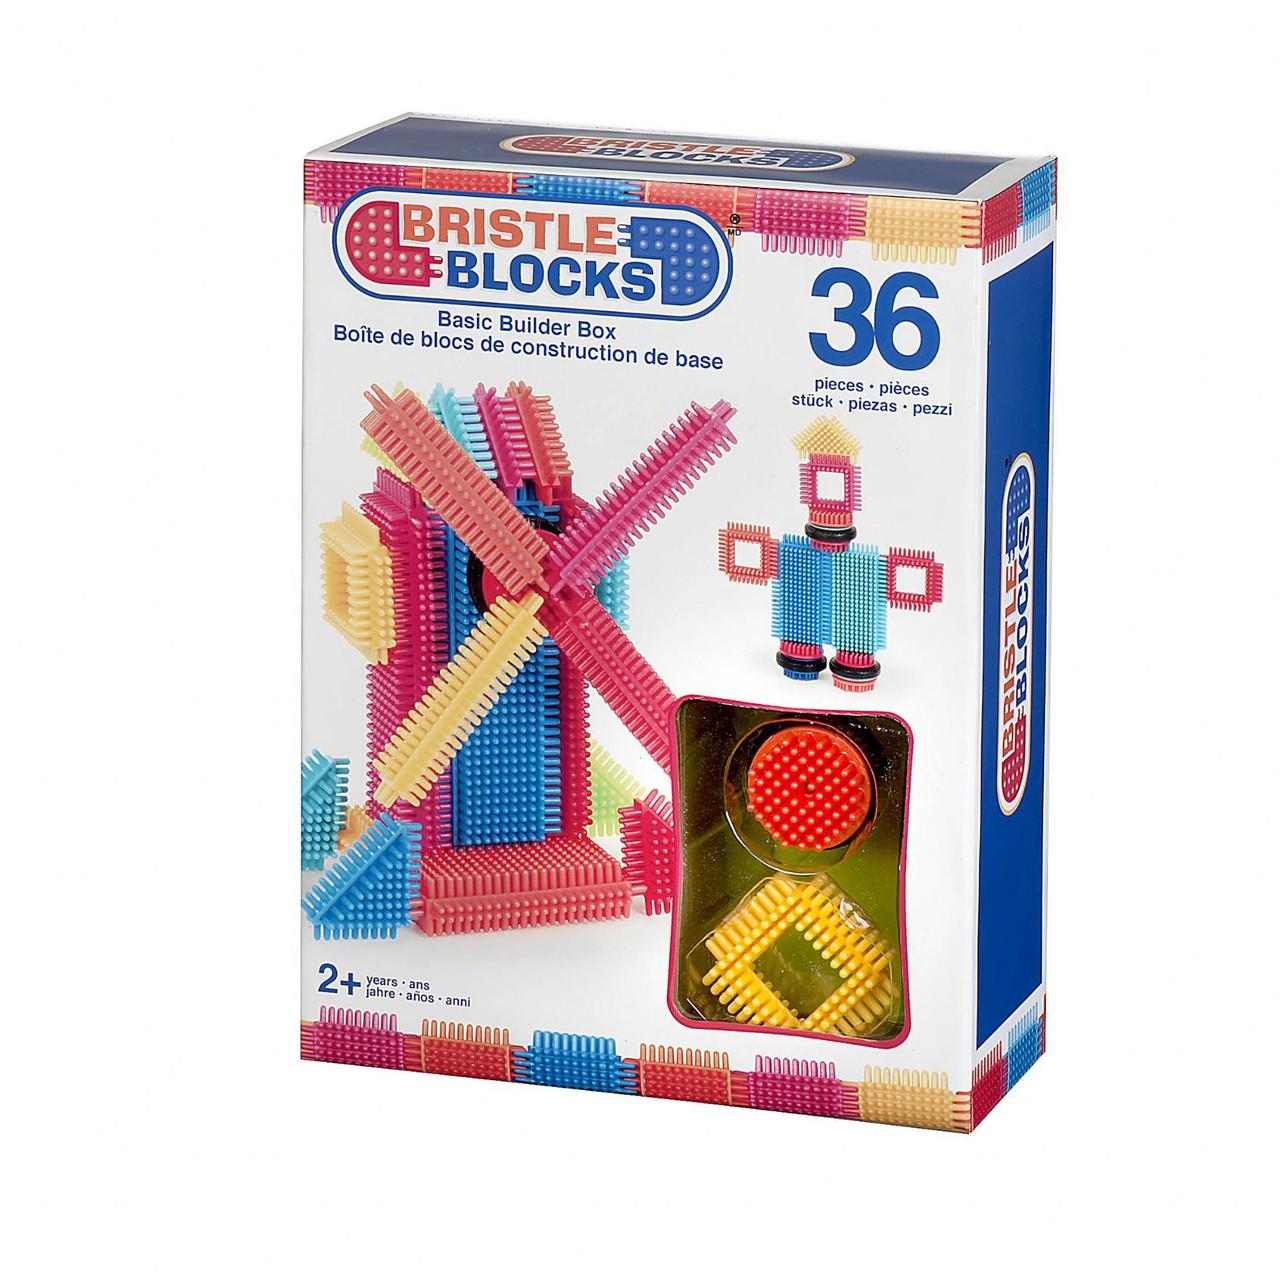 Конструктор-брістл Bristle Blocks Будівельник g3099Z